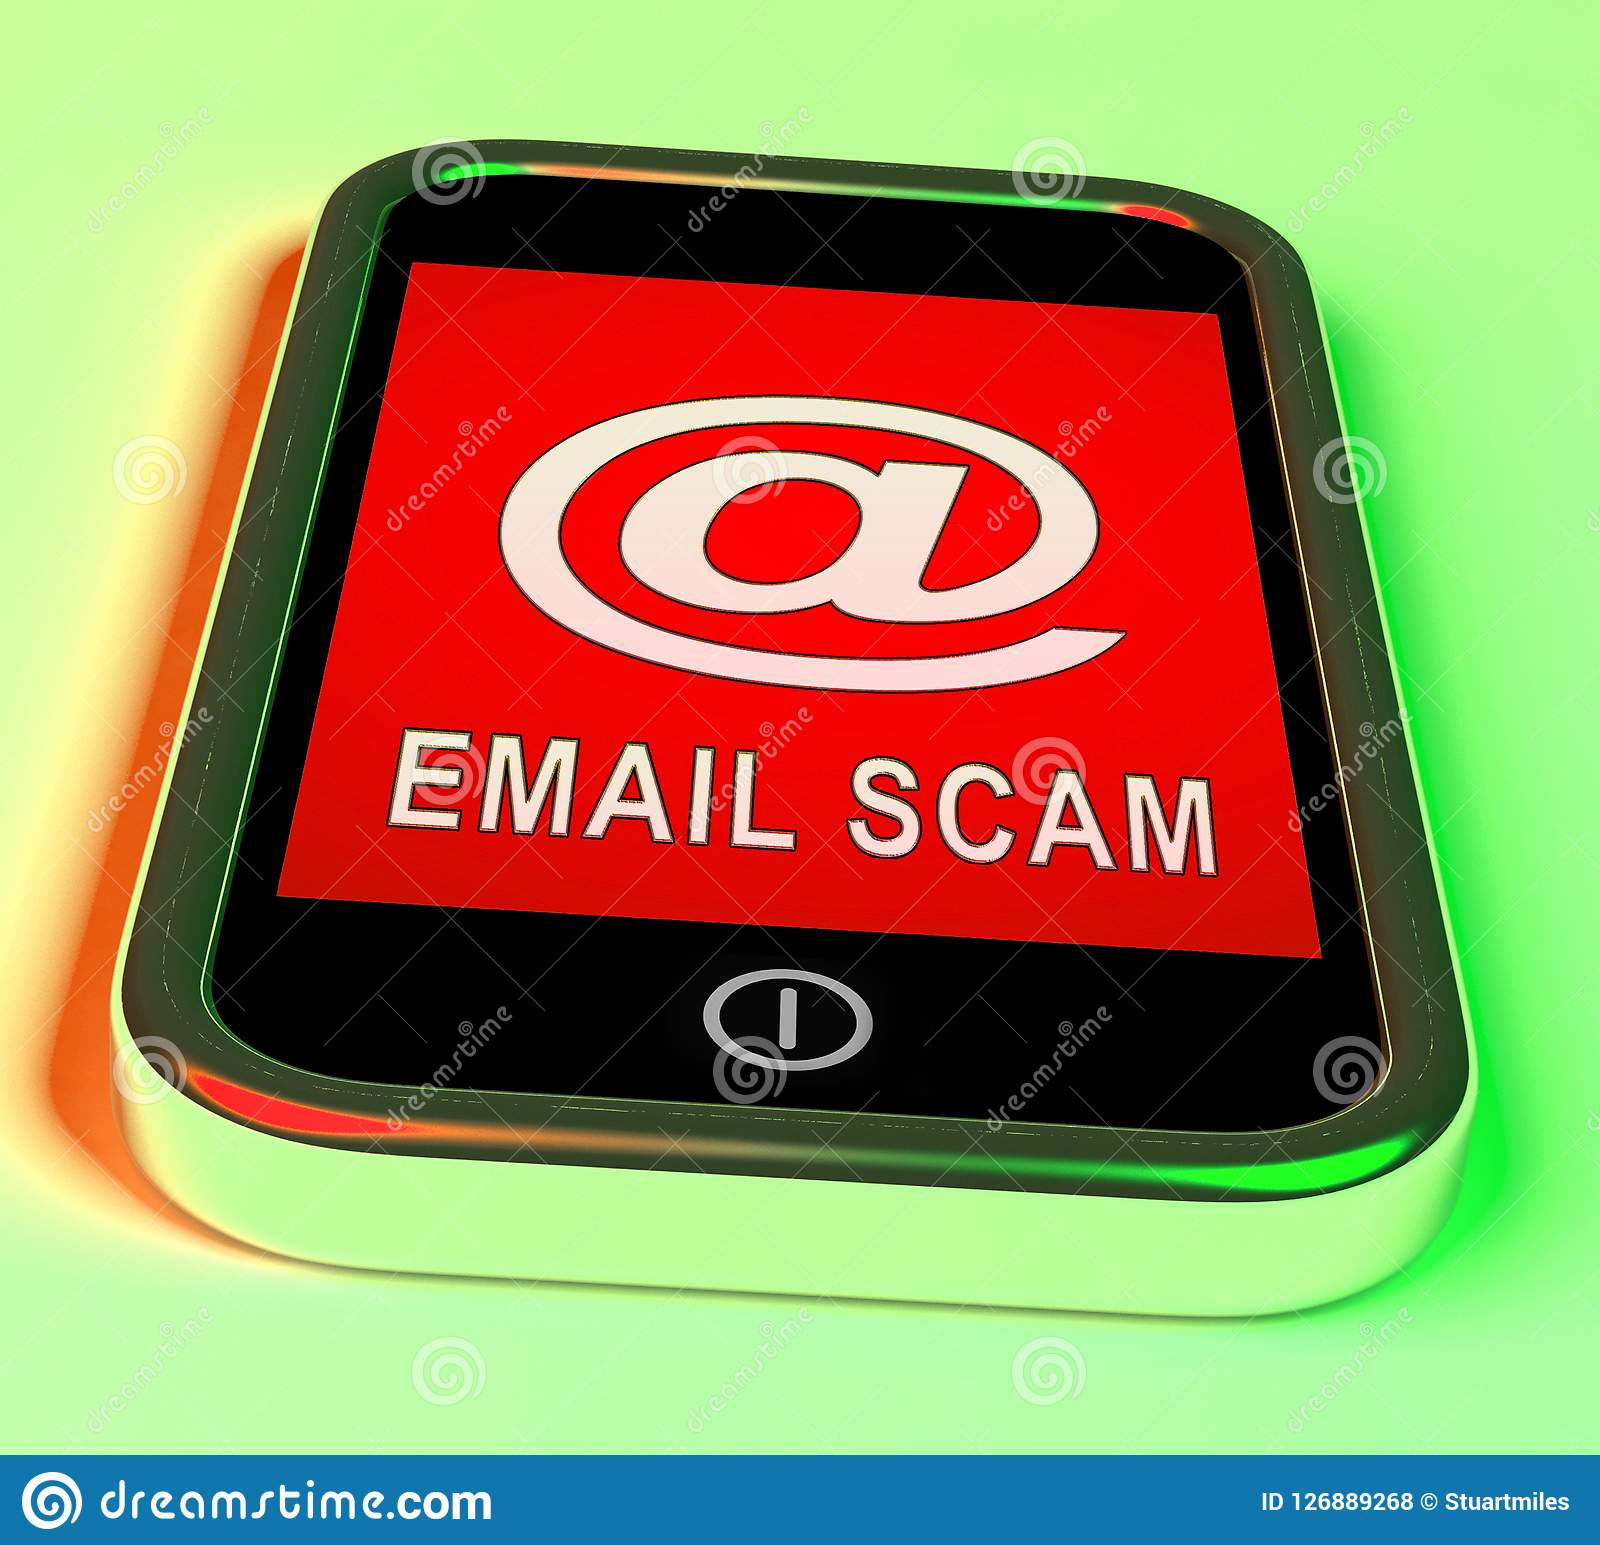 Phishing Scam Email Identity Alert 3d Rendering Stock